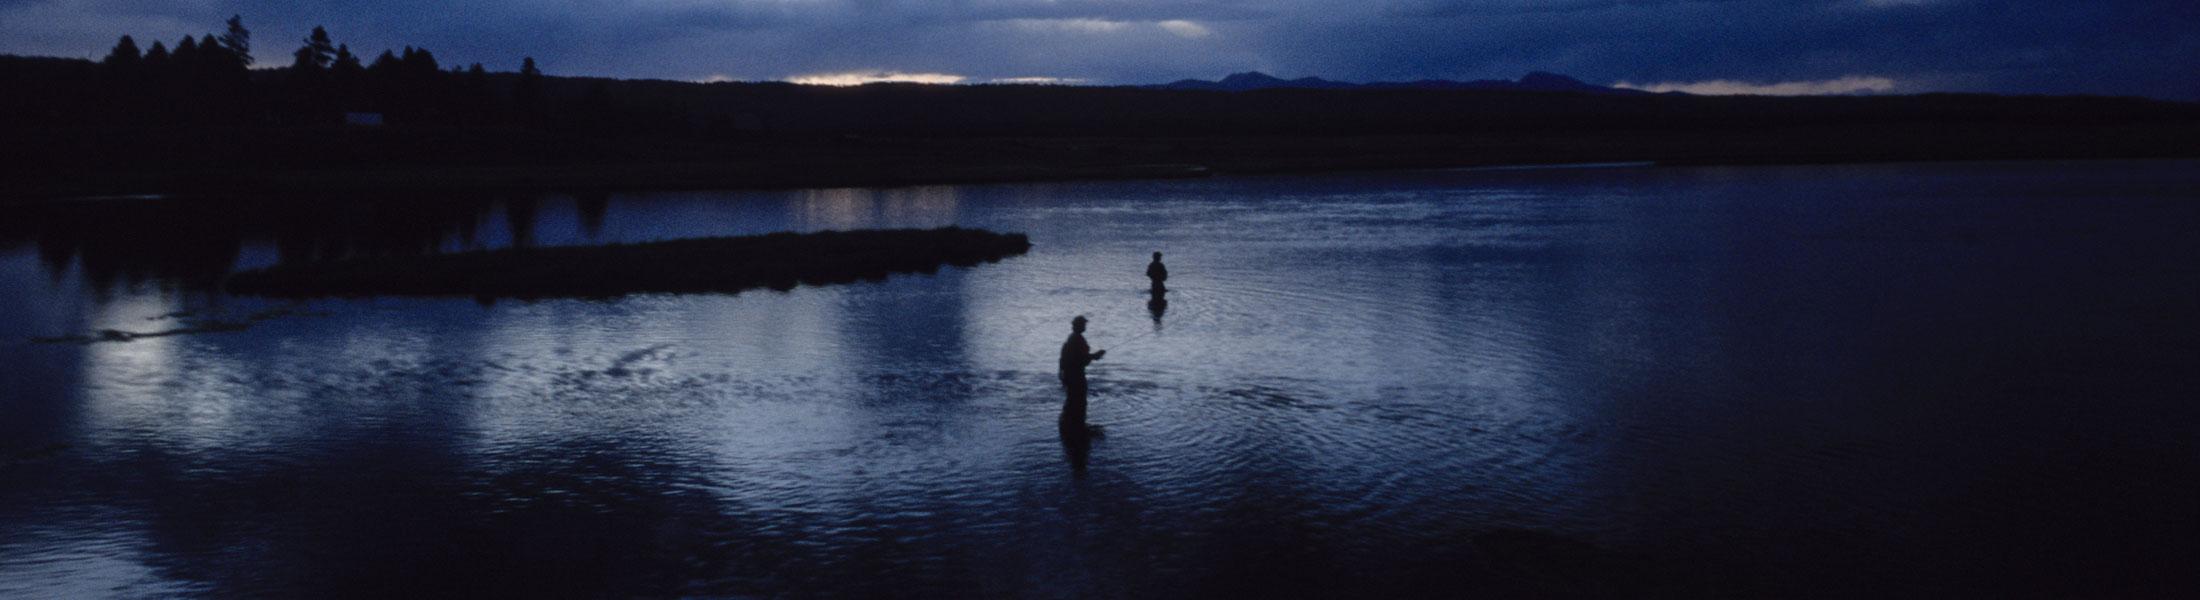 parallax-banner_fishing